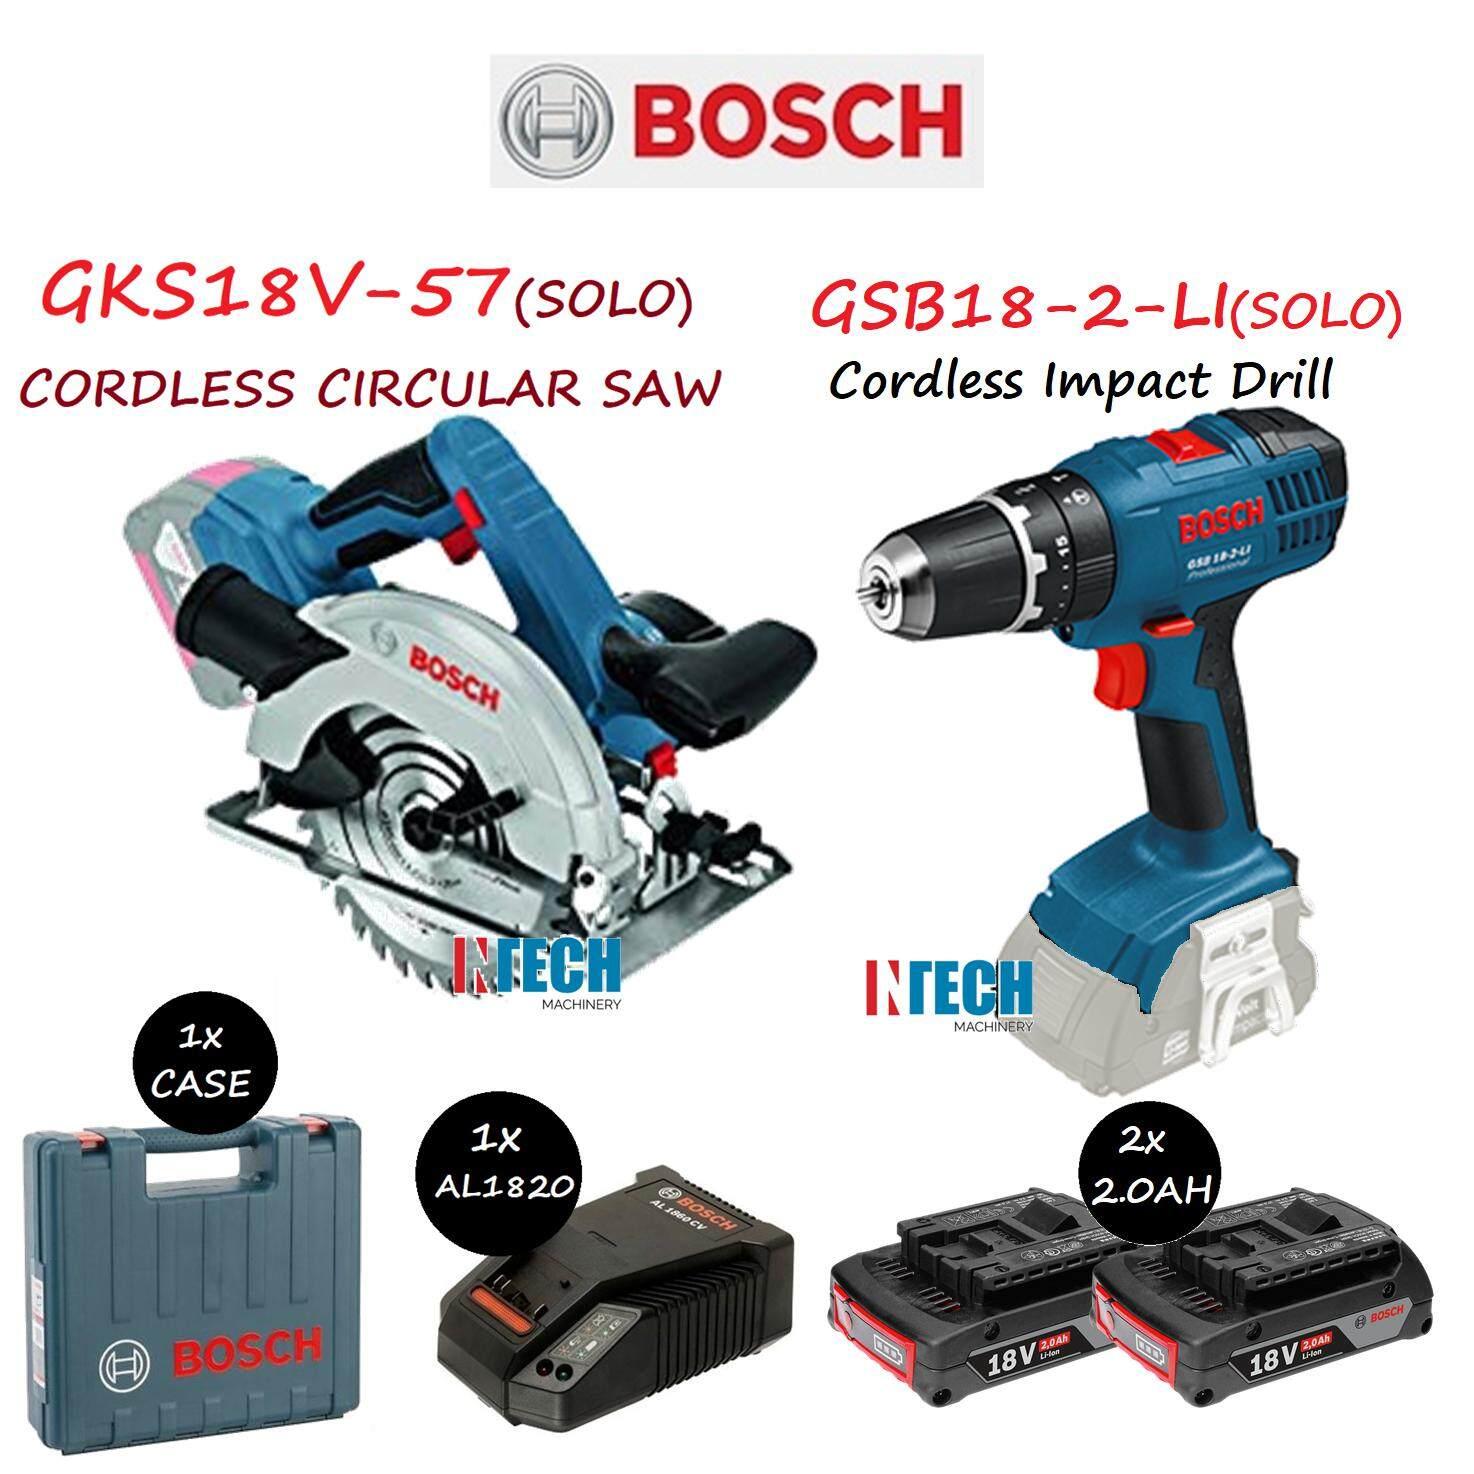 BOSCH GSB18-2-LI CORDLESS IMPACT DRILL  + GKS18V-57(SOLO) CORDLESS CIRCULAR SAW